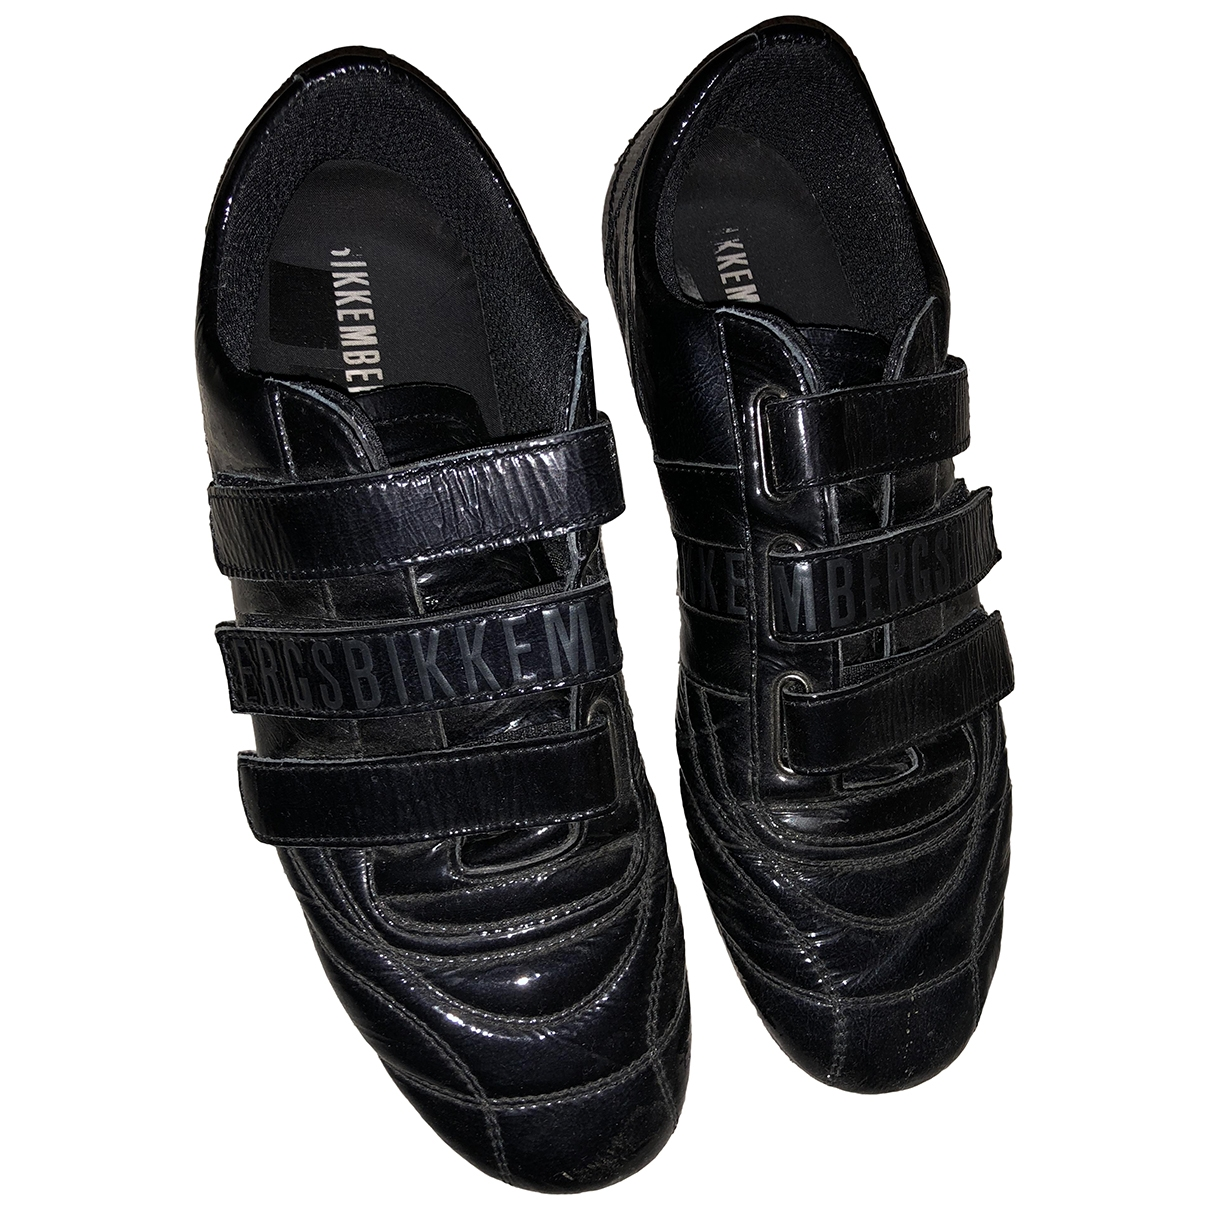 Dirk Bikkembergs - Baskets   pour homme en cuir verni - noir